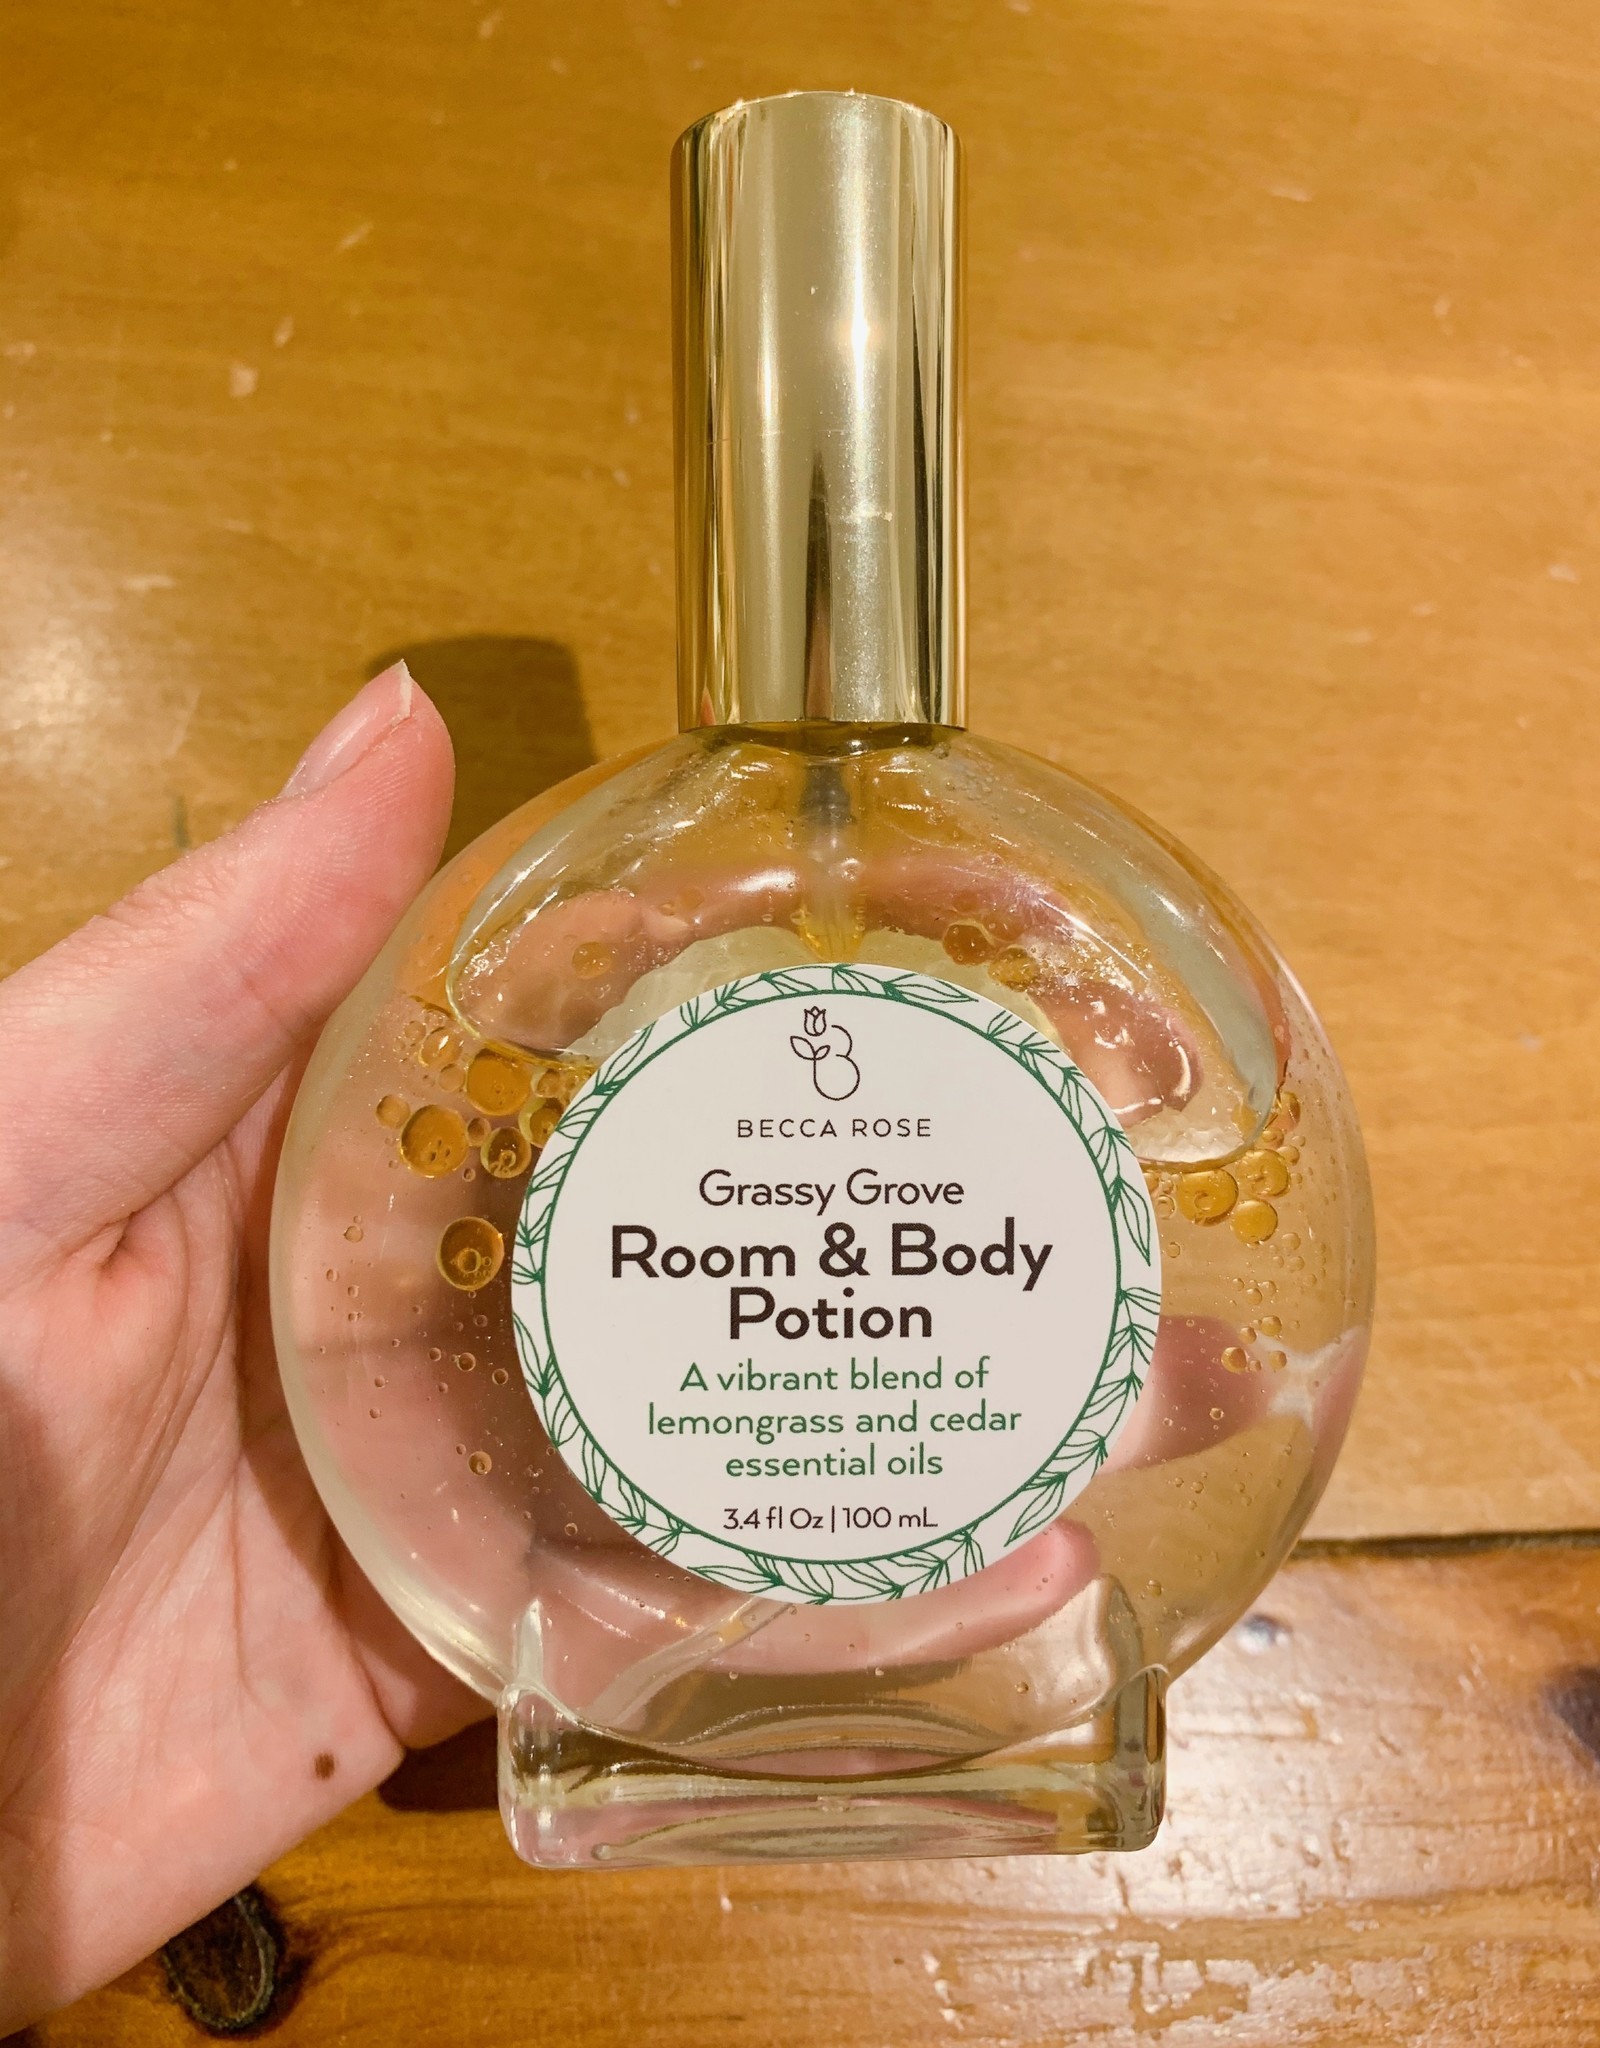 Becca Rose Room & Body Potion: Grassy Grove